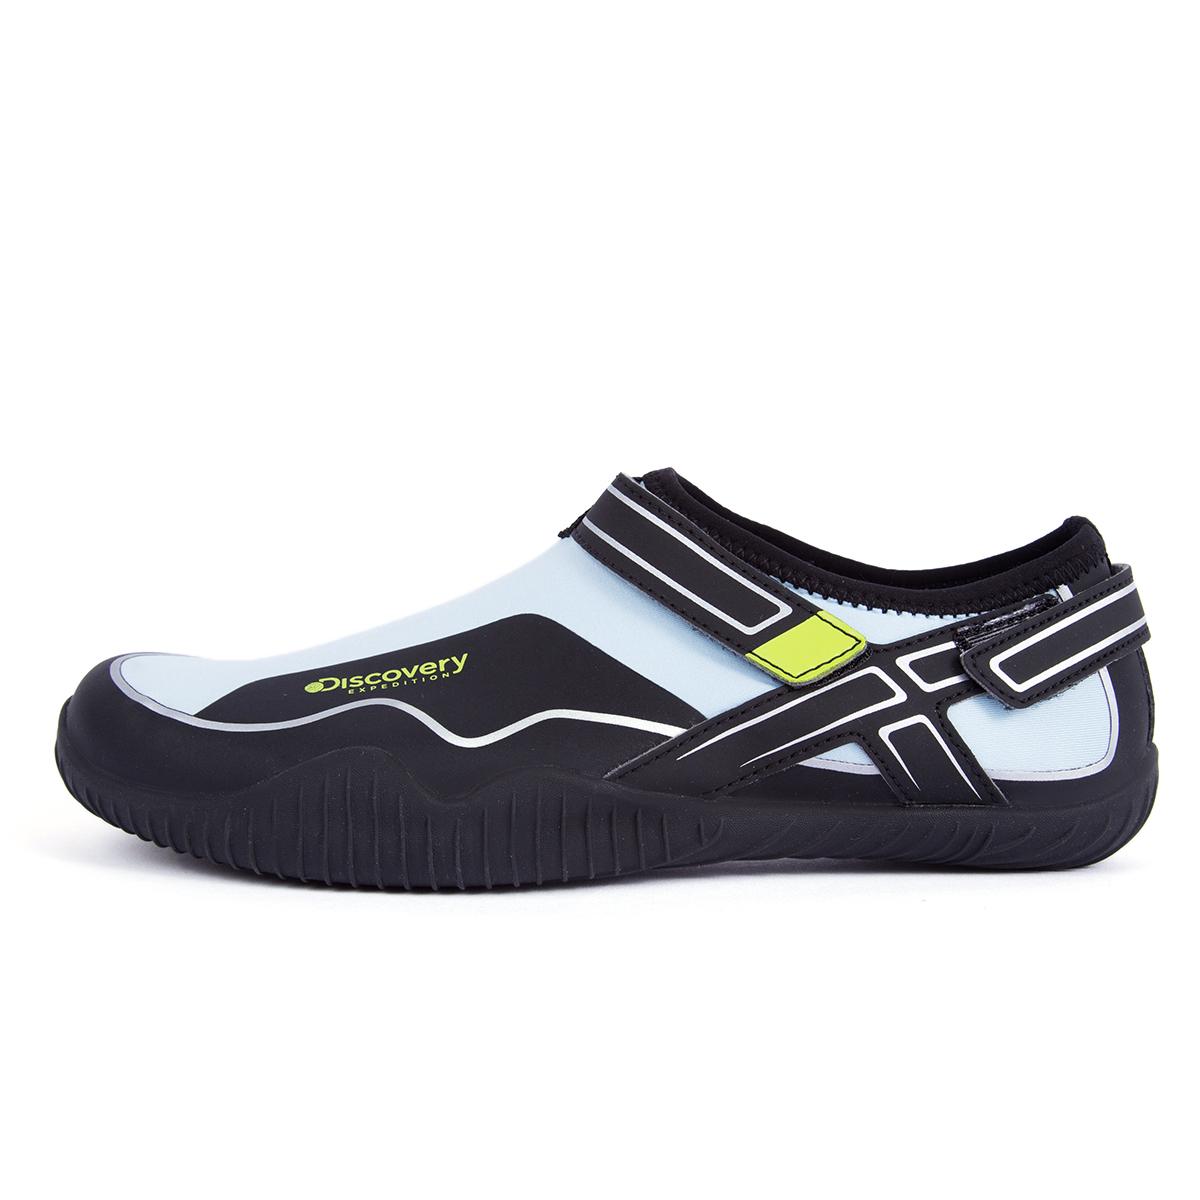 DFGH81033 春夏新品男式沙滩鞋 2019 户外 Discovery